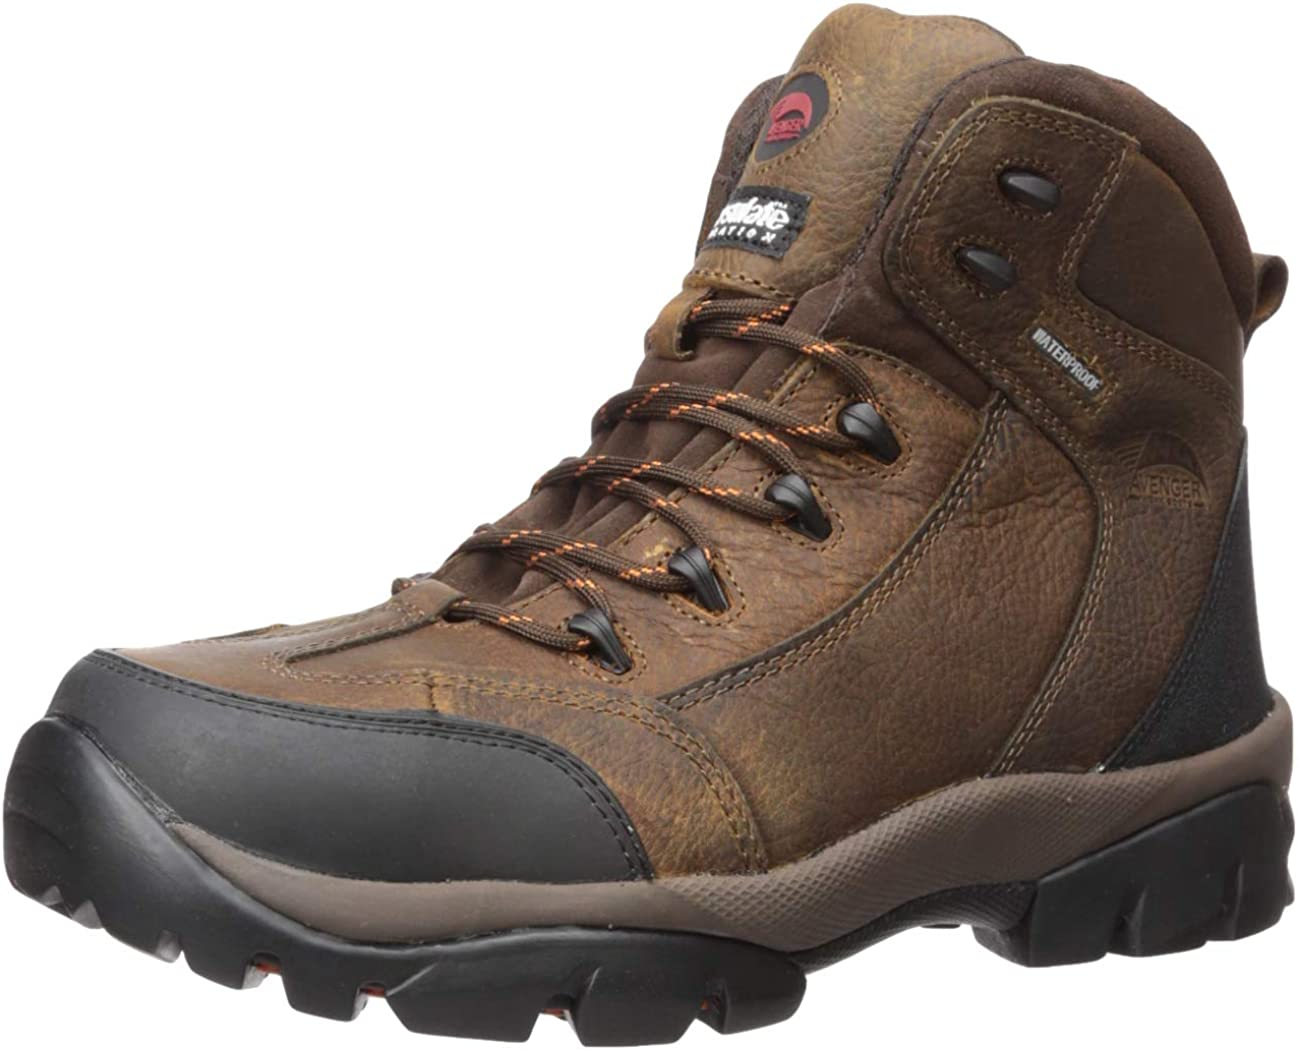 Amazon.com: Avenger Safety Footwear Men